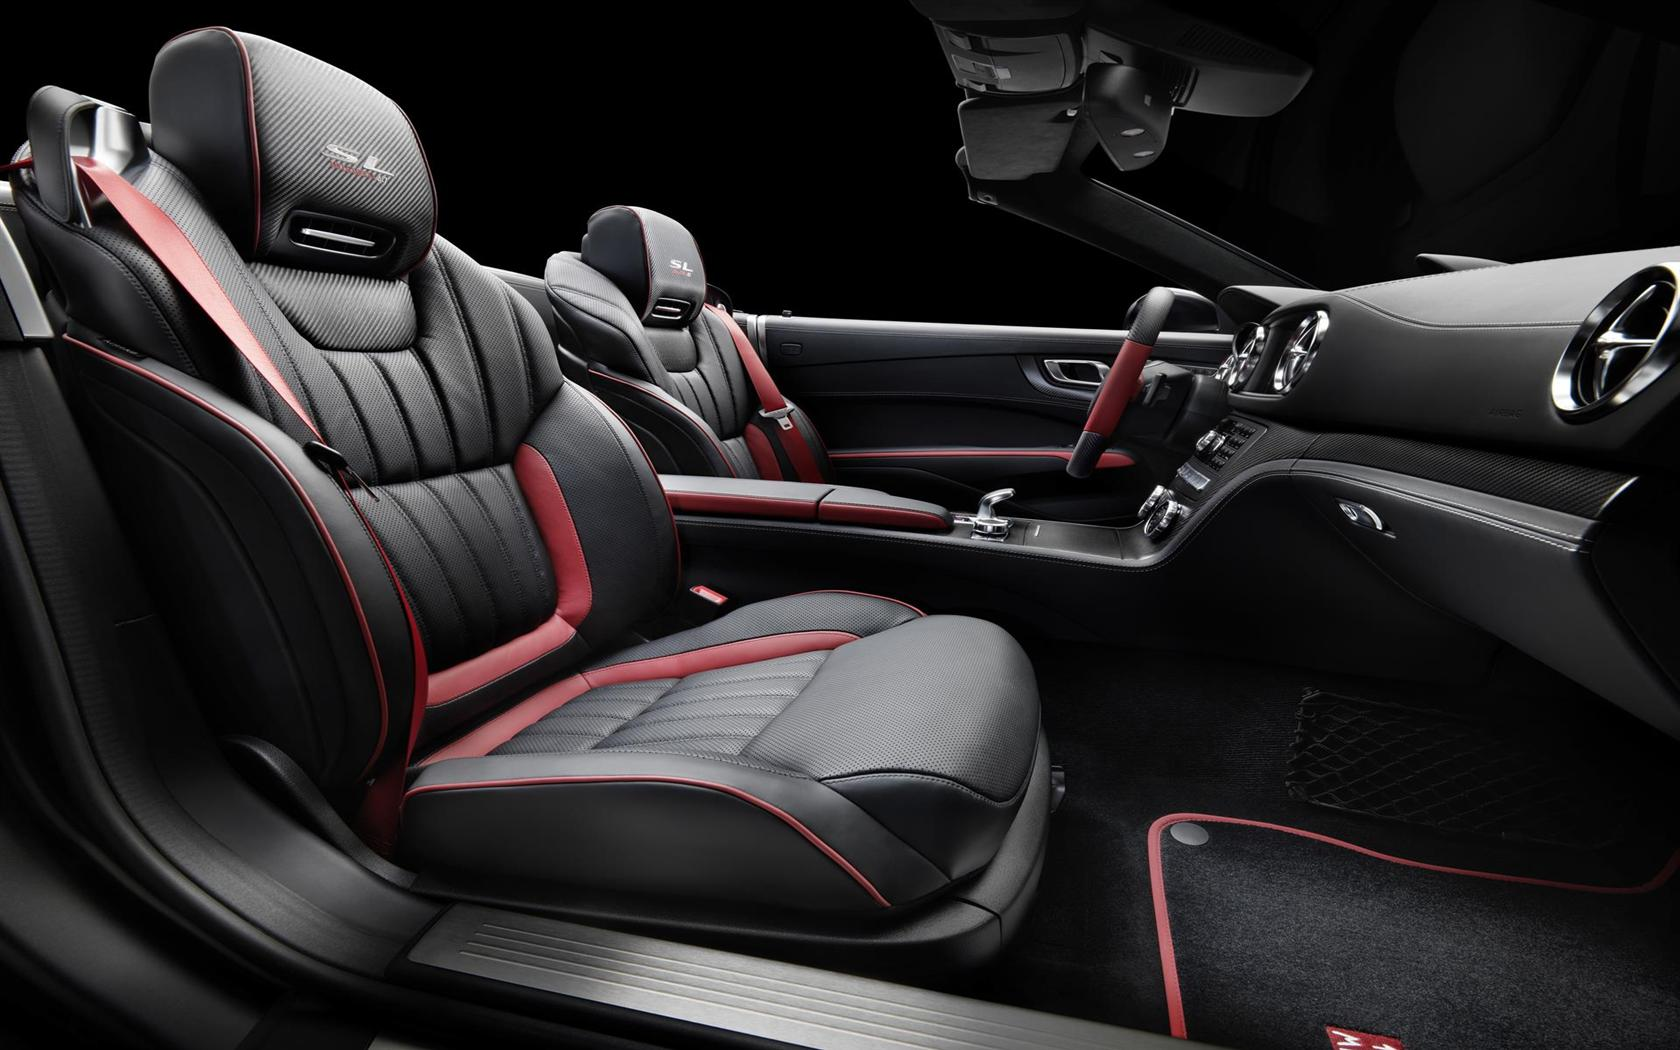 2015 Mercedes-Benz SL Mille Miglia 417 Special Edition